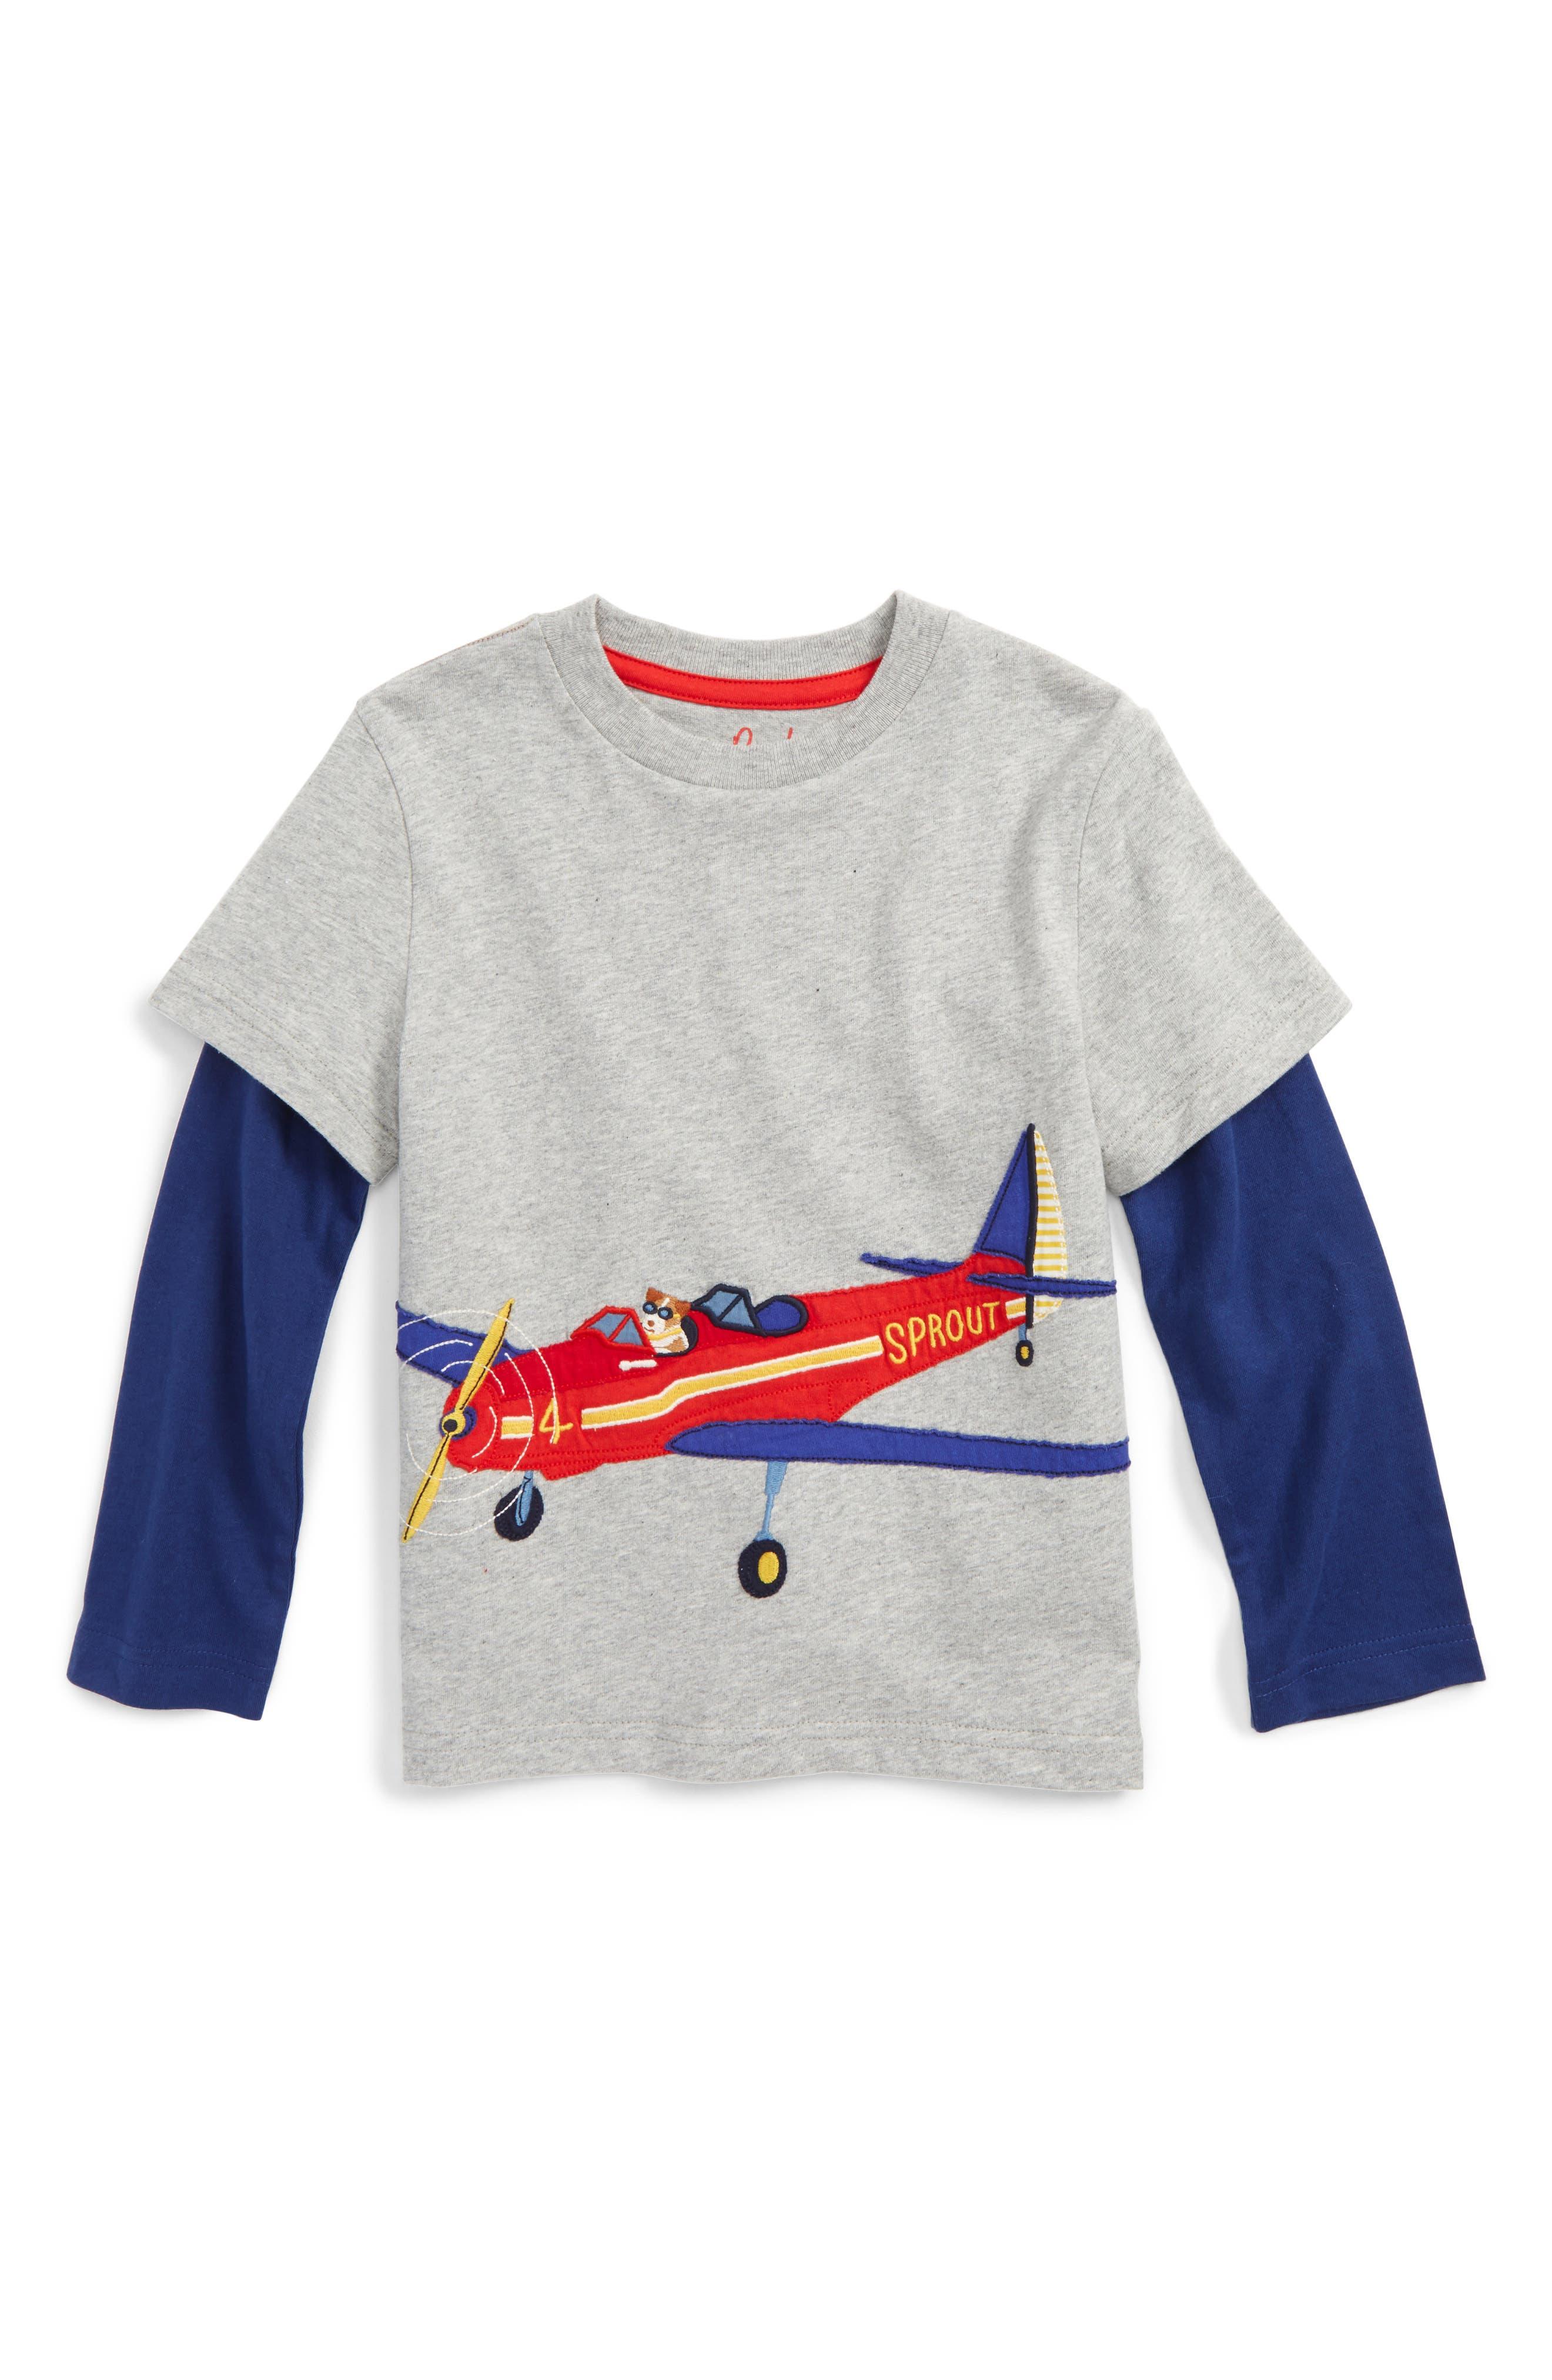 Main Image - Mini Boden Vehicle Appliqué Layer T-Shirt (Toddler Boys, Little Boys & Big Boys)